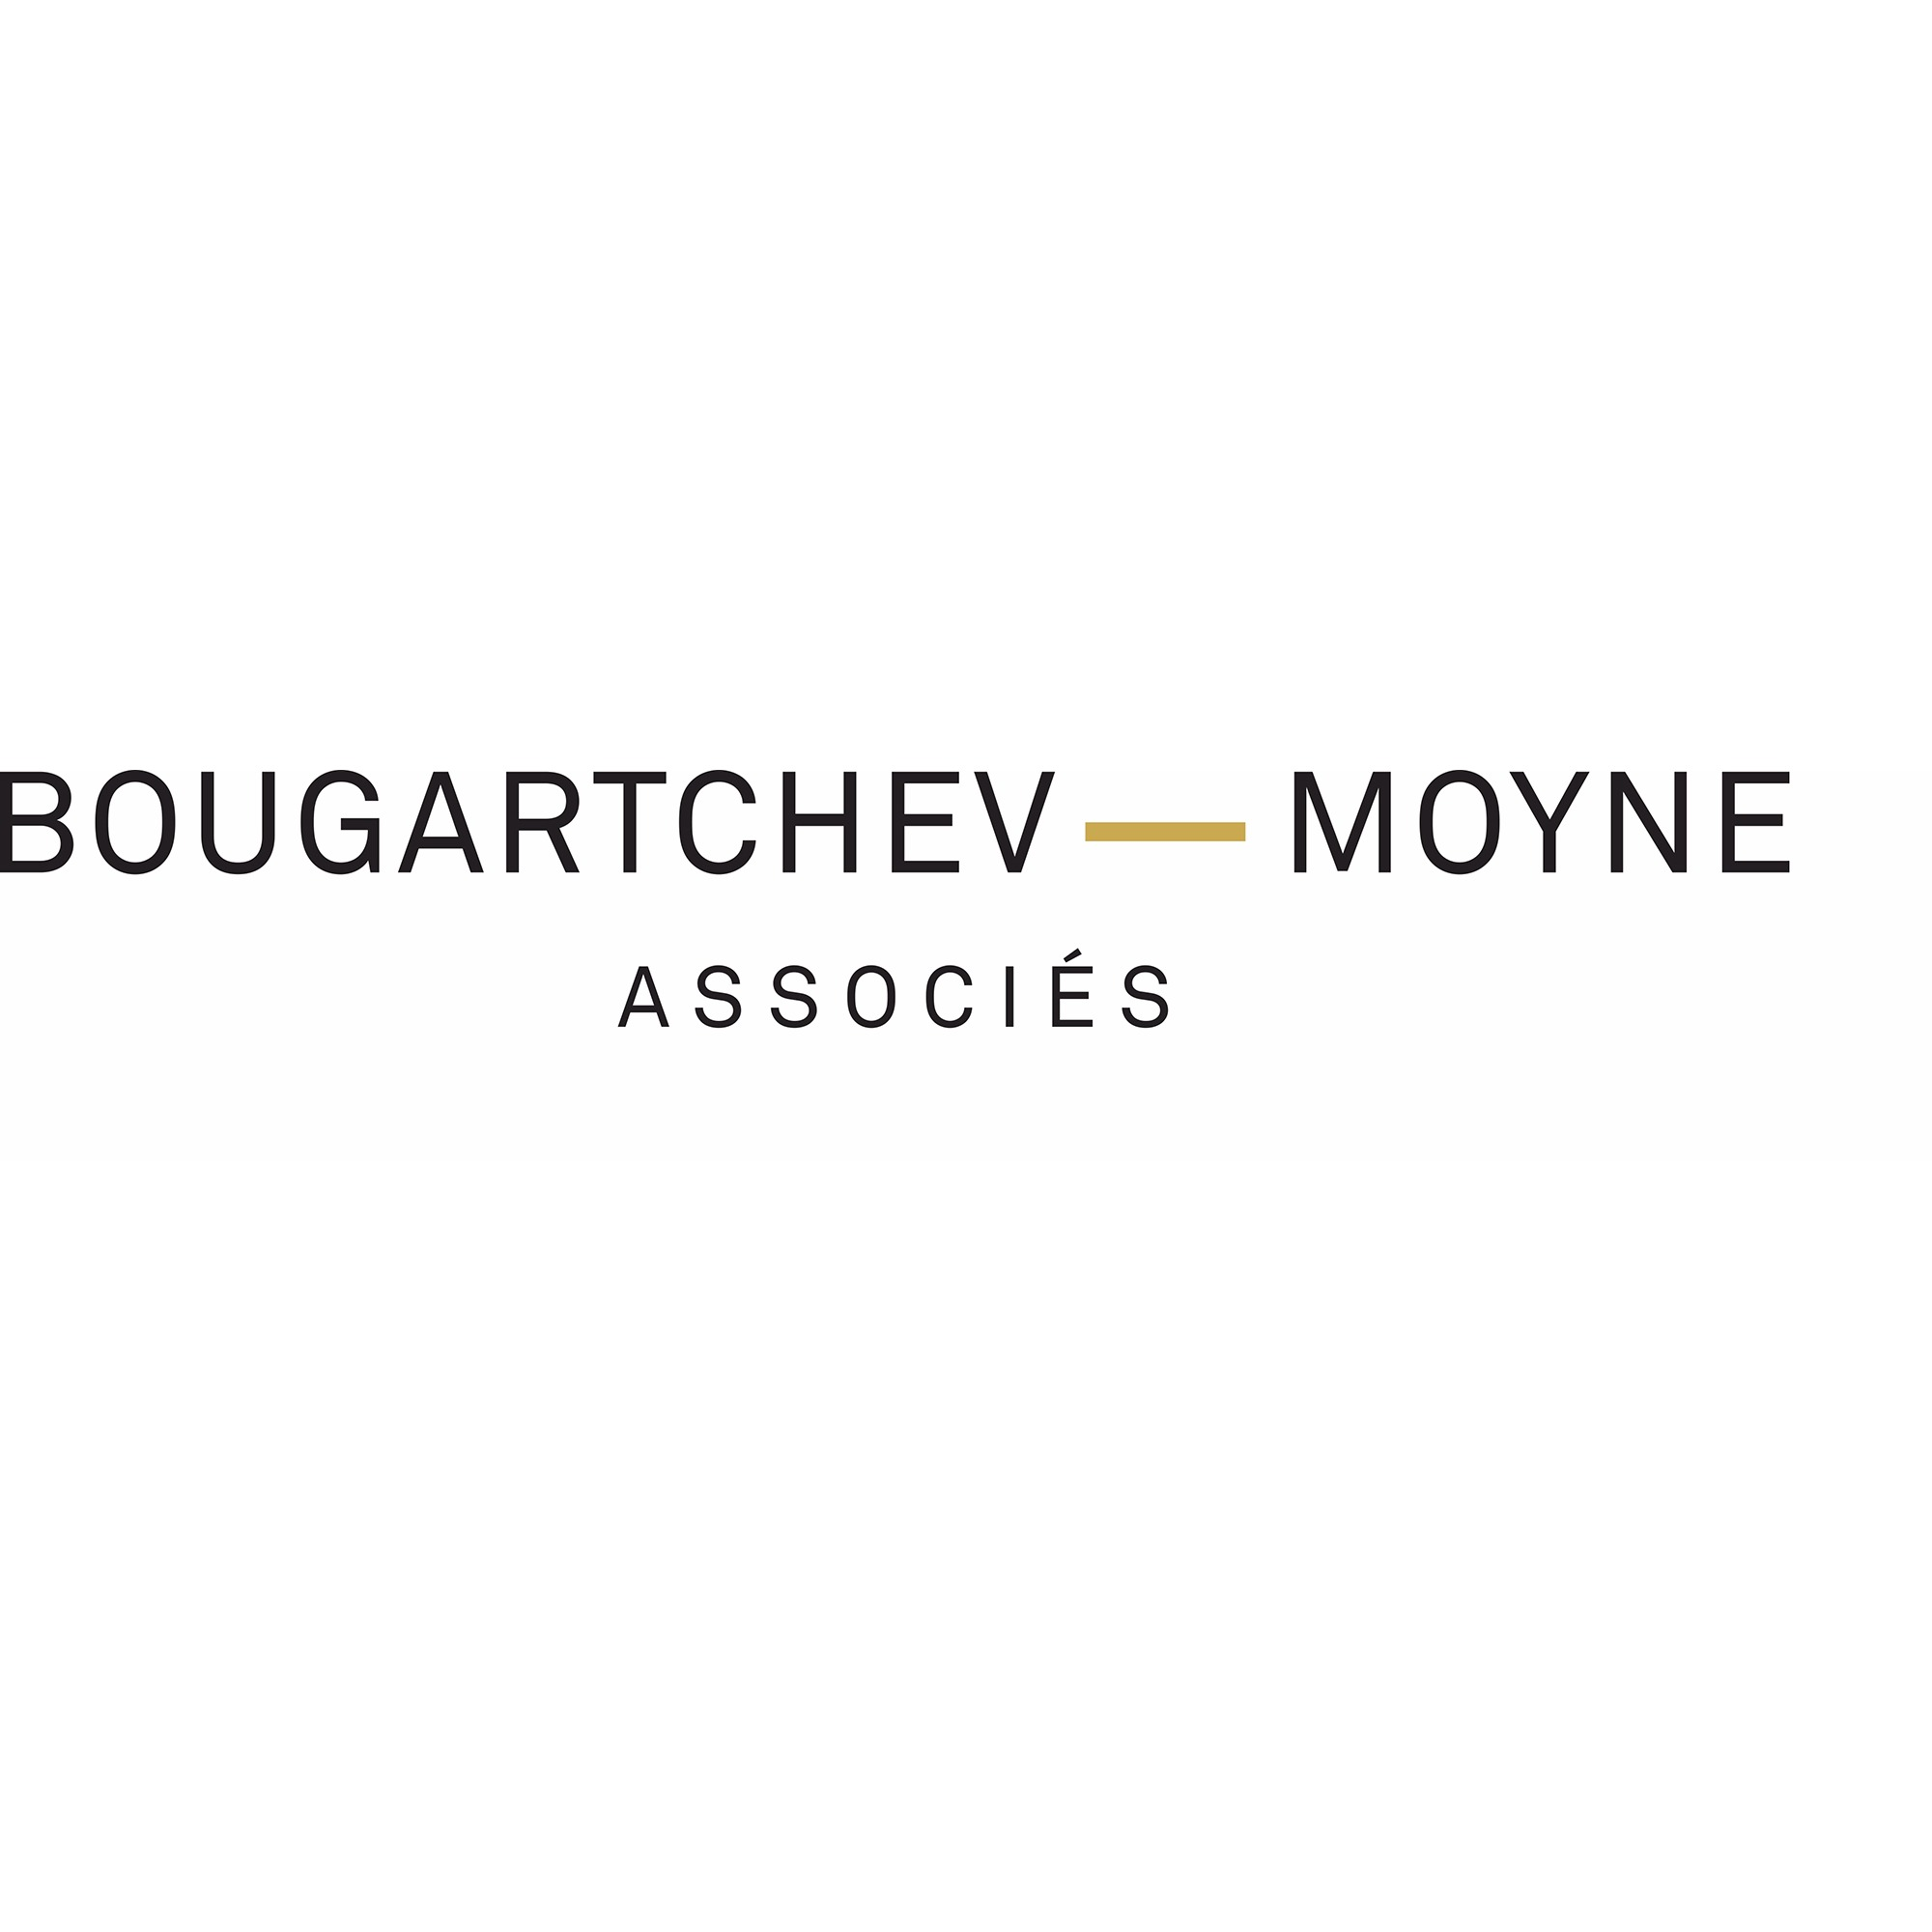 the Bougartchev Moyne Associés logo.